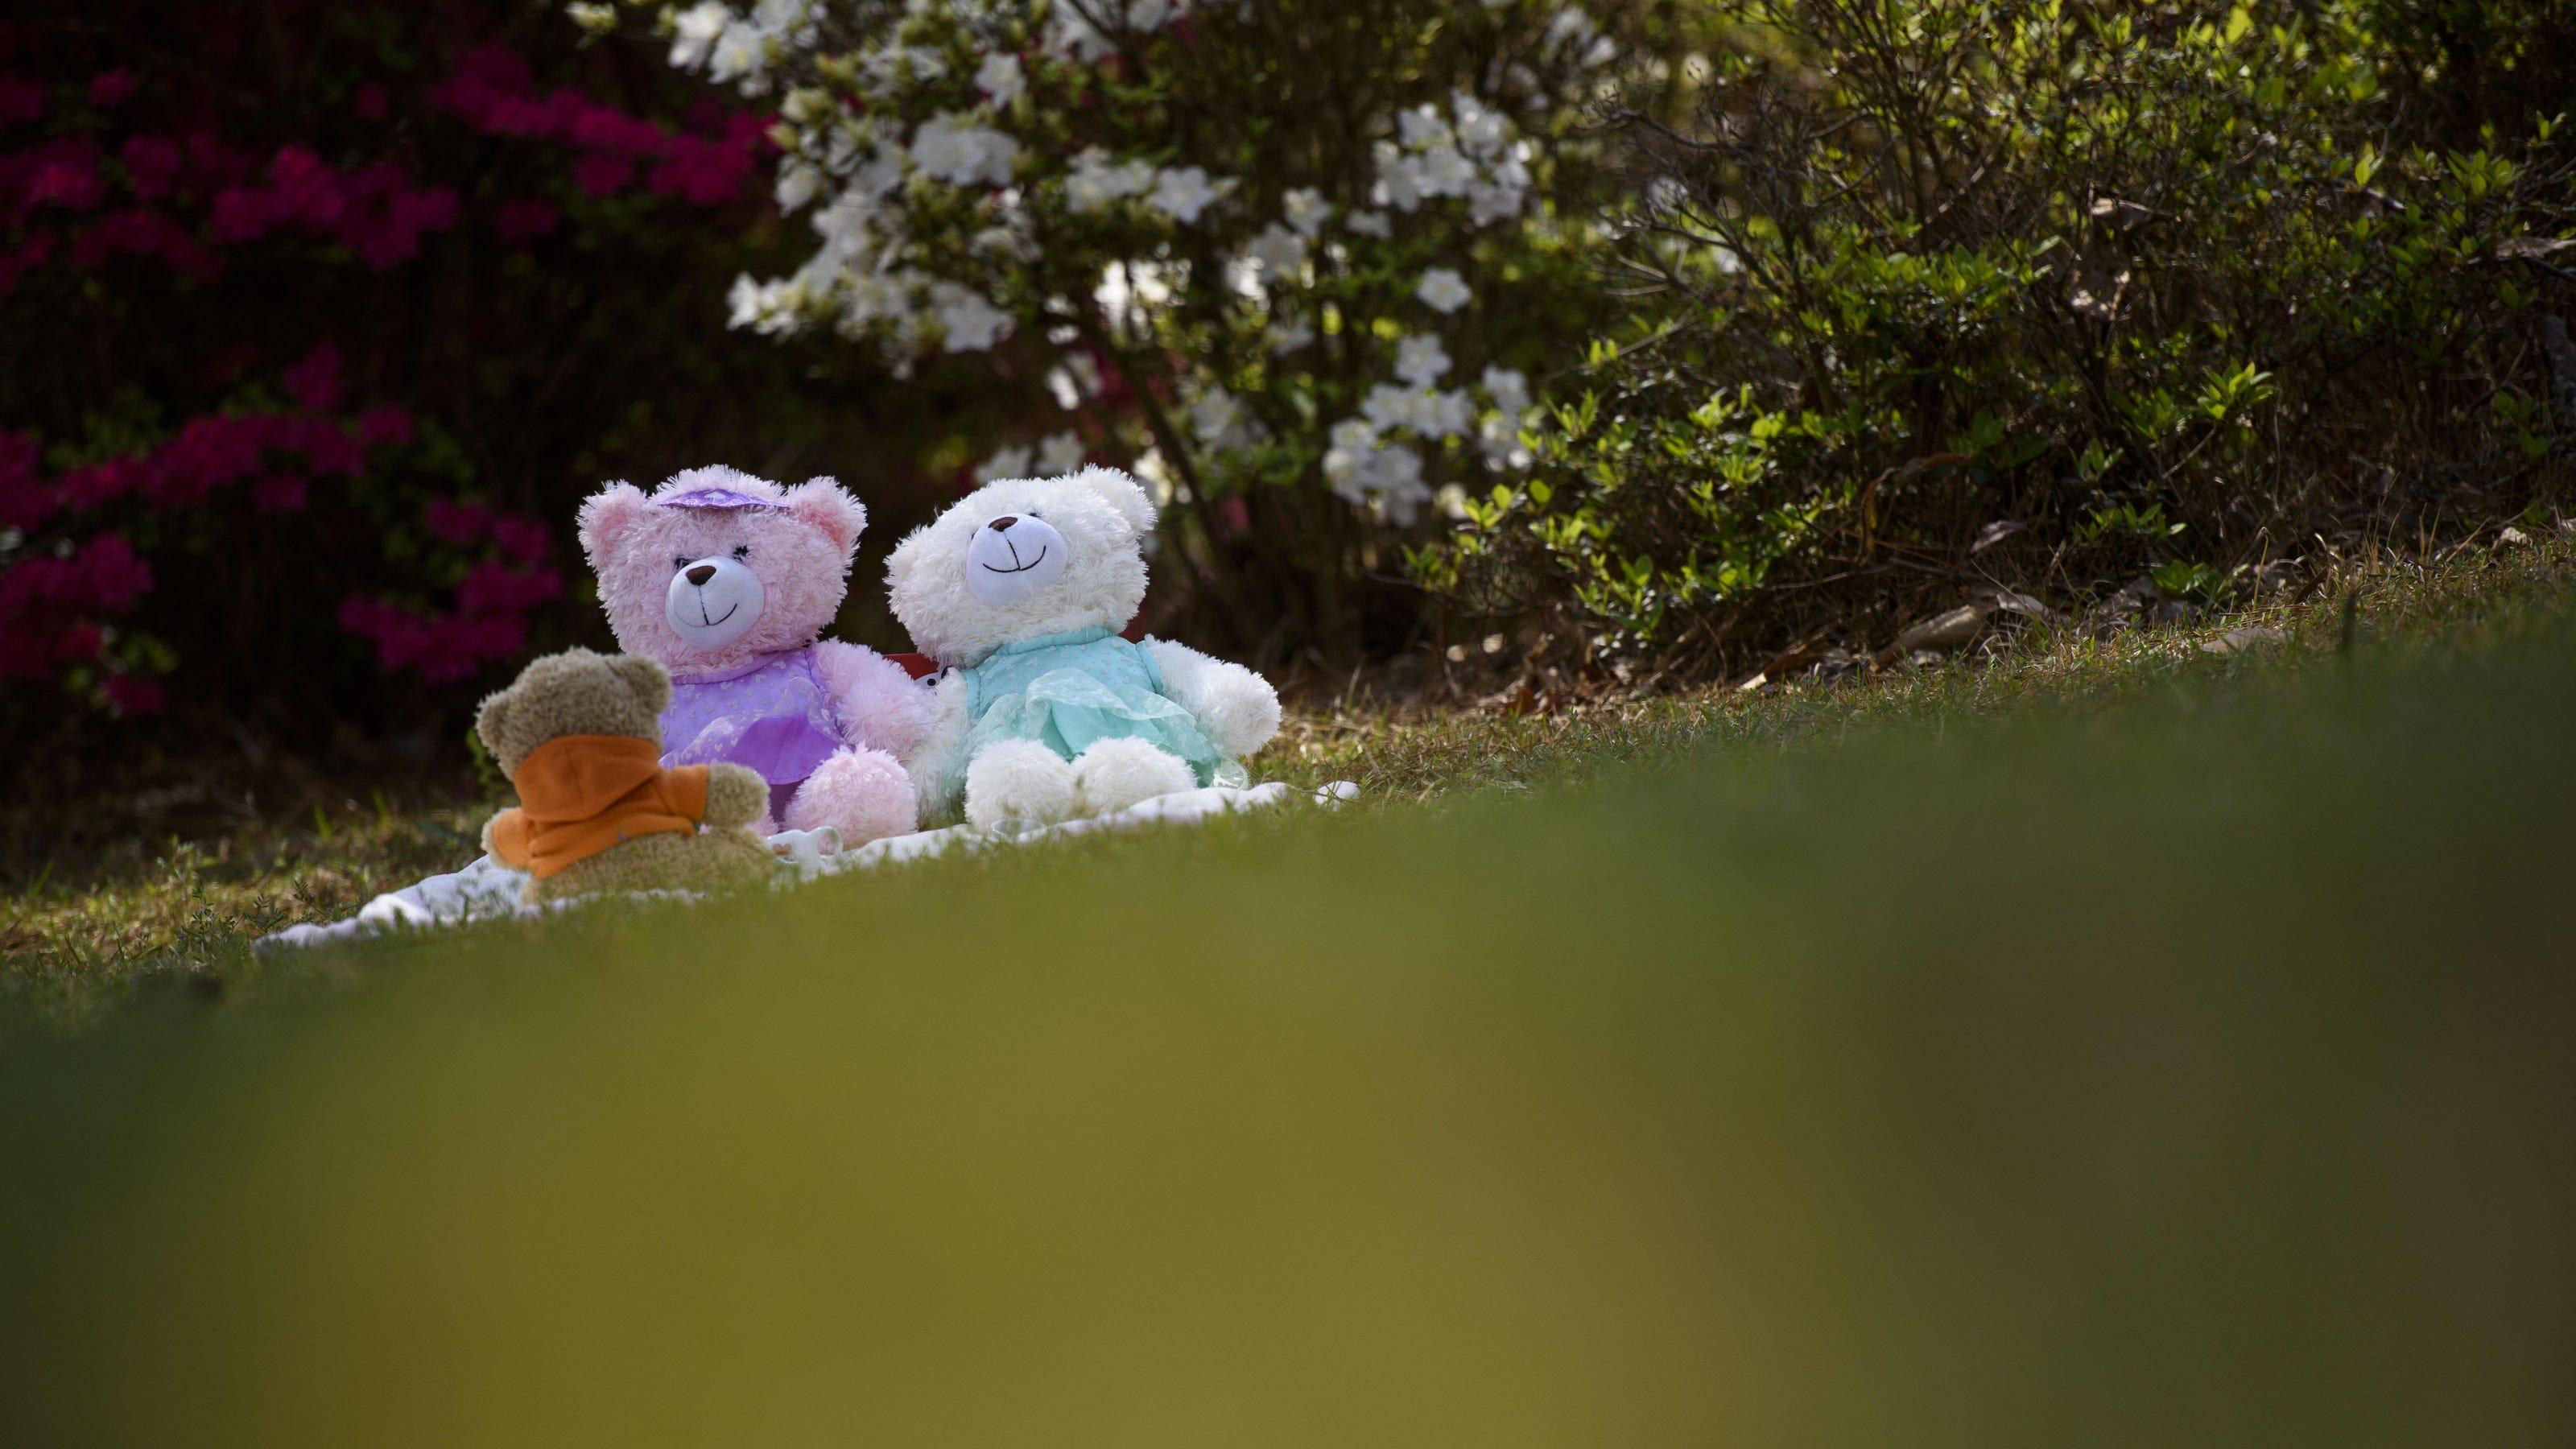 Fayetteville Nc Kinwood Christmas Lights 2020 Teddy bears and Christmas lights: Fayetteville neighbors find ways